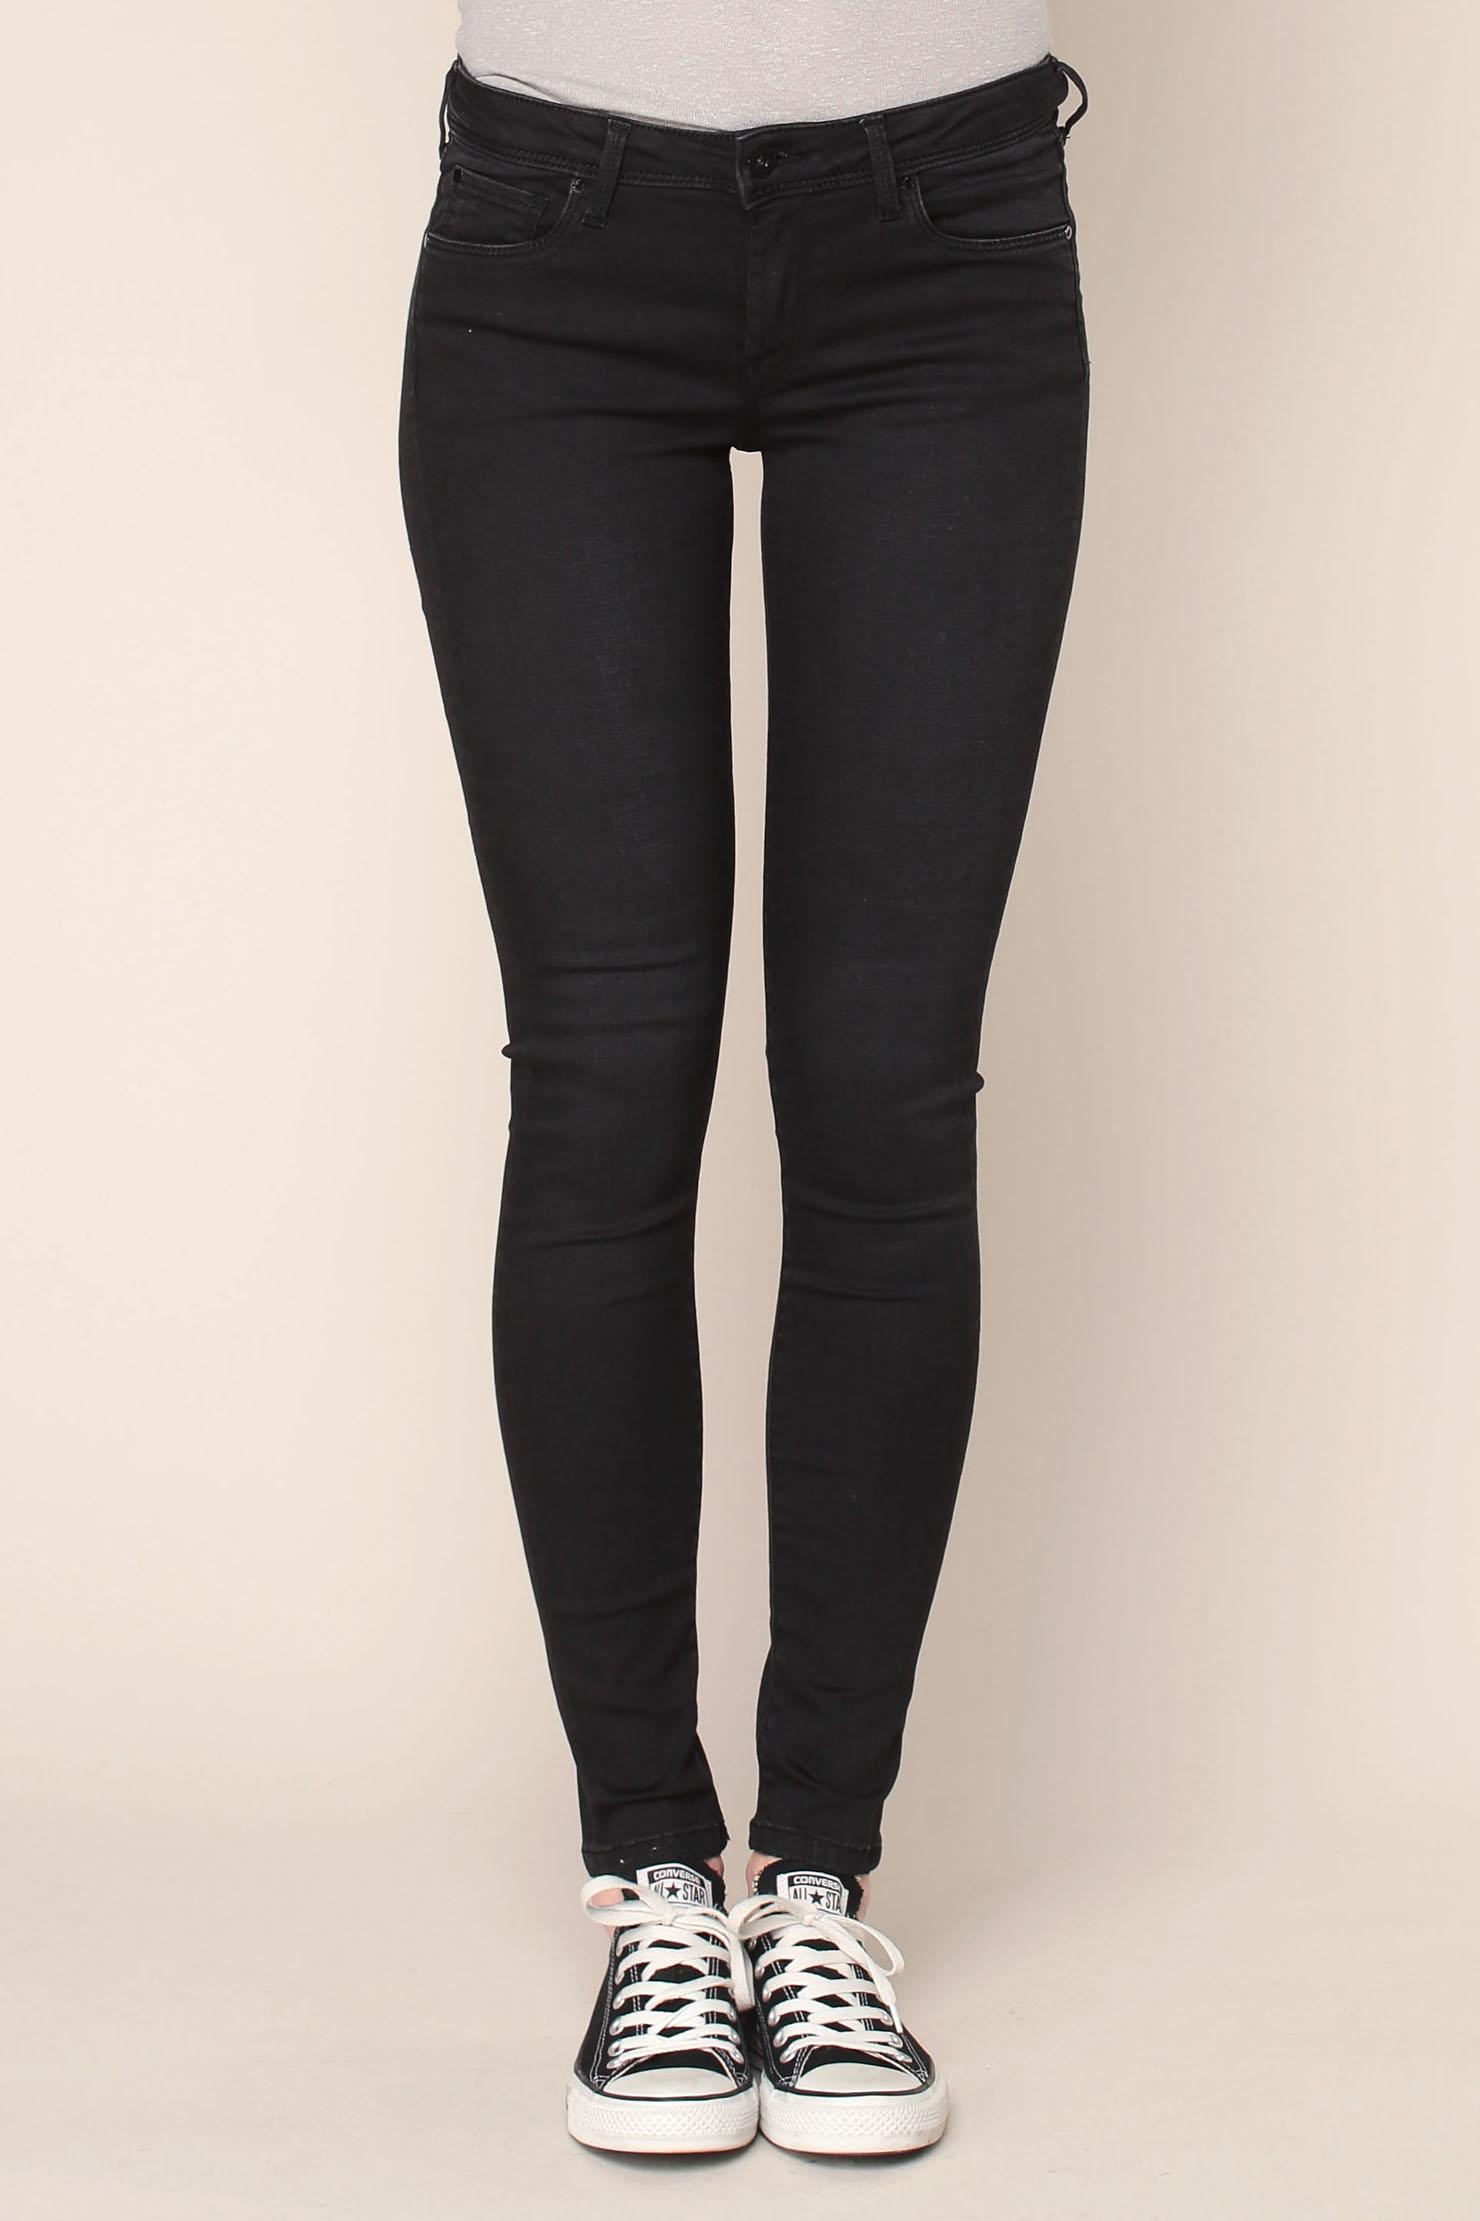 Pepe jeans soho skinny jeans in black lyst - Pepe jeans showroom ...